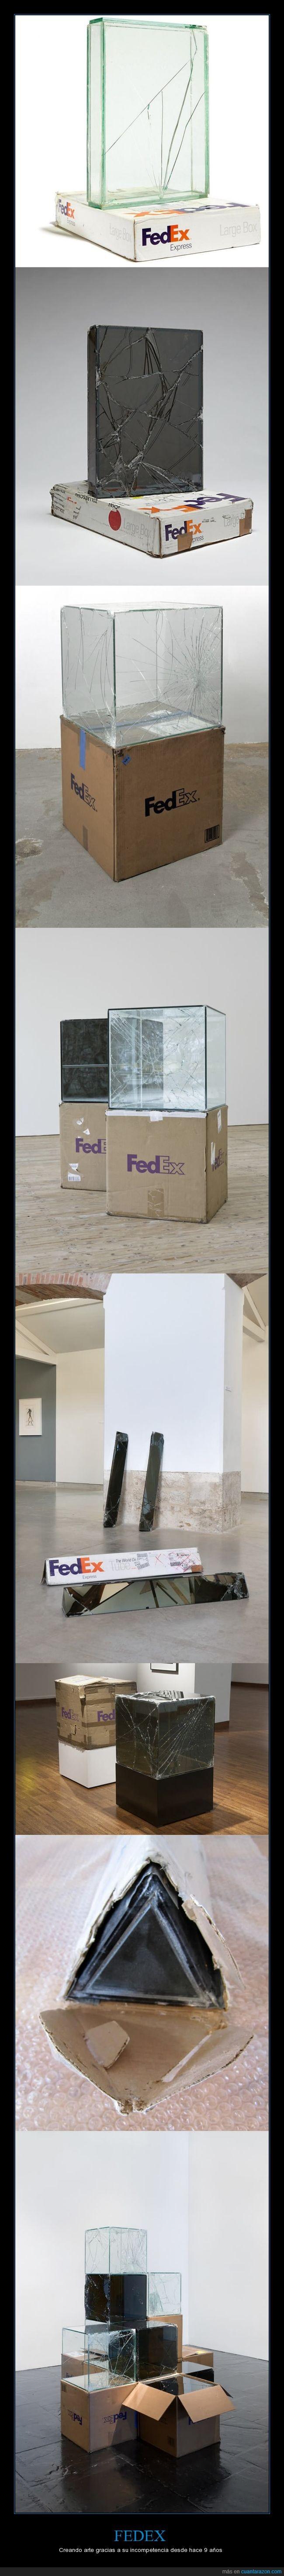 arte,cajas,cristal,fedex,vidrio